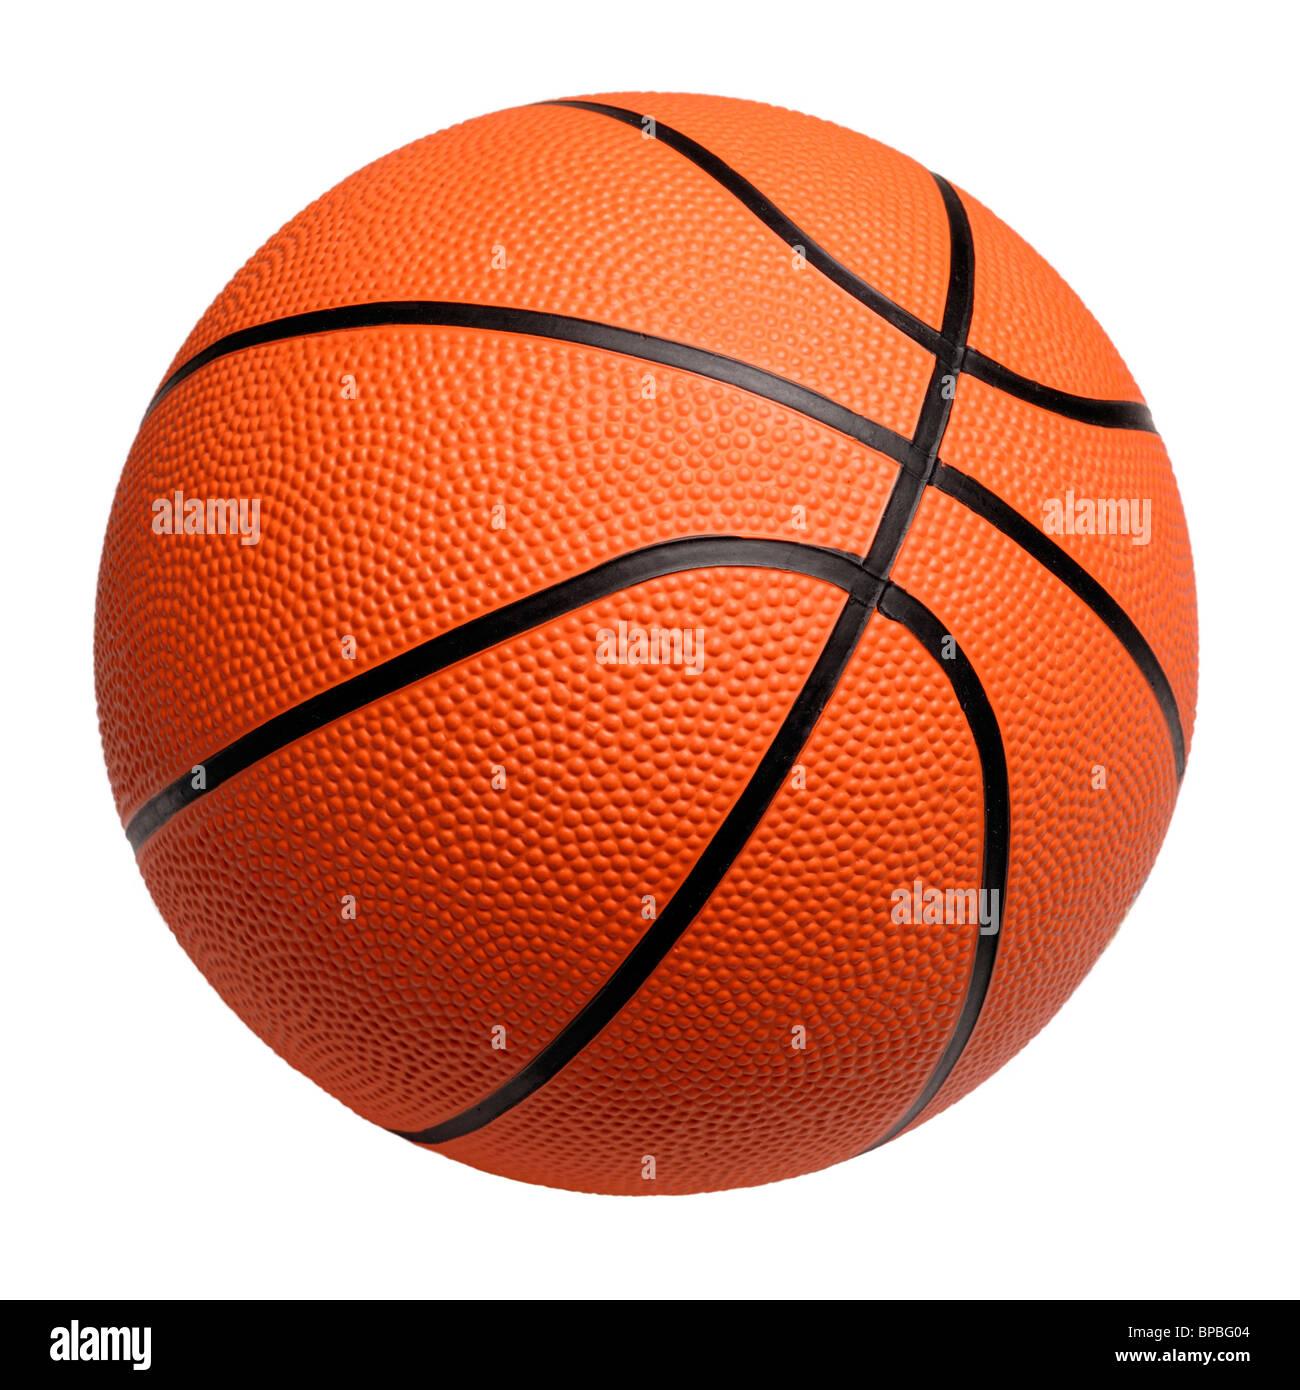 Basket-ball en plastique orange Photo Stock